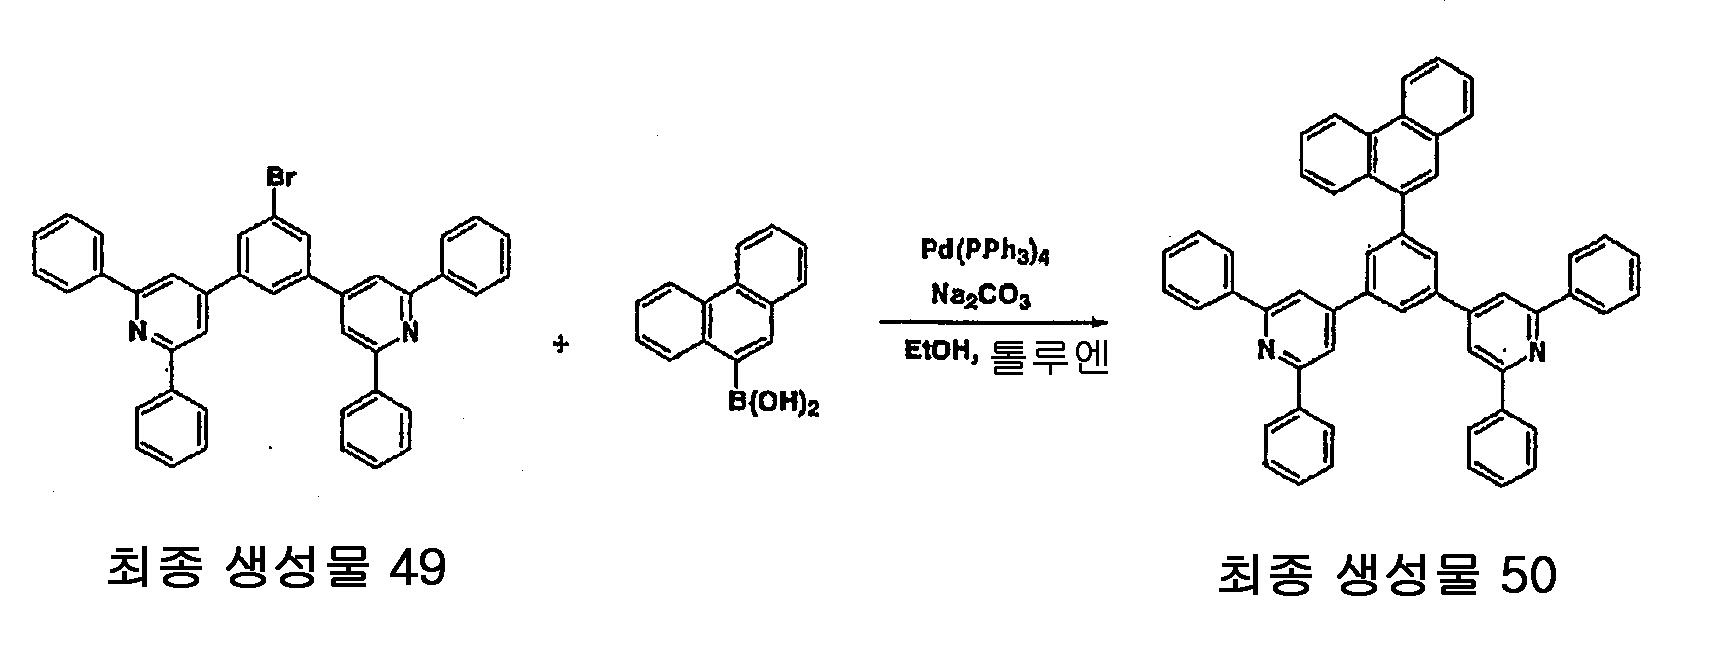 Figure 112010002231902-pat00138